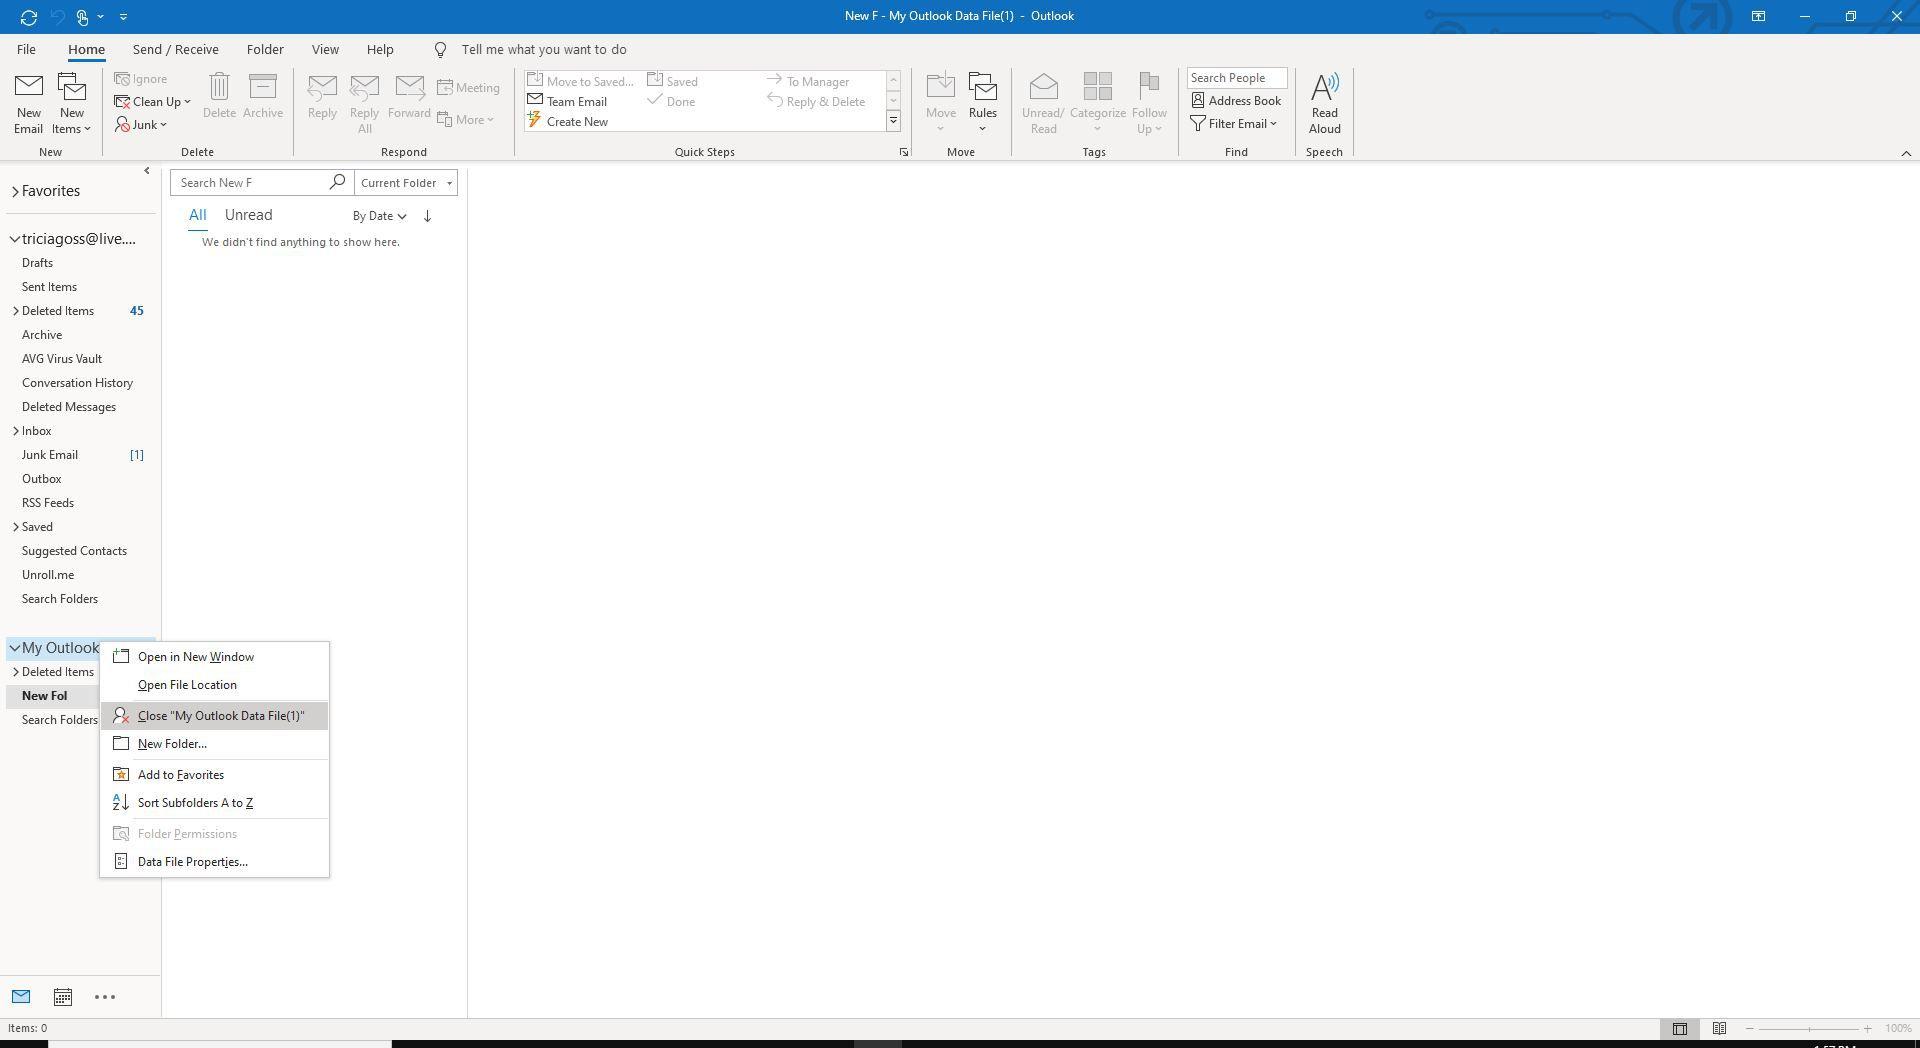 Screenshot of Close Outlook Data File in right-click menu